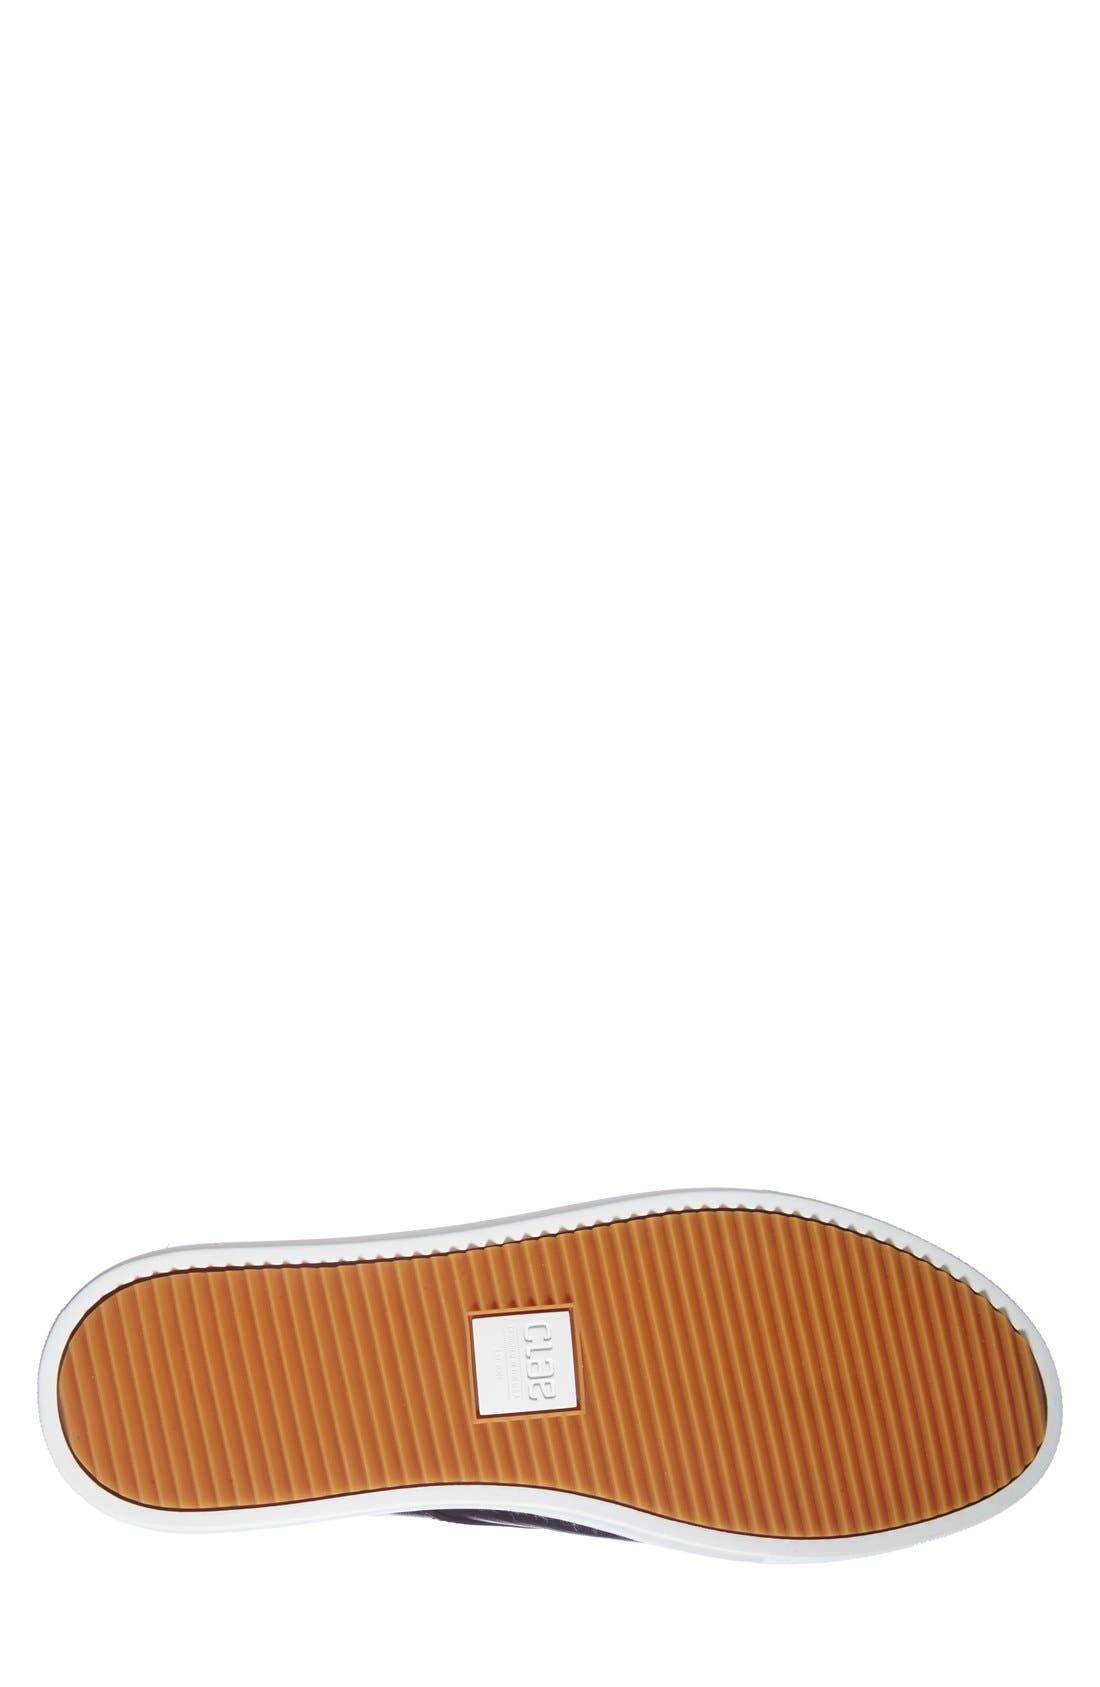 'Ellington' Sneaker,                             Alternate thumbnail 4, color,                             012